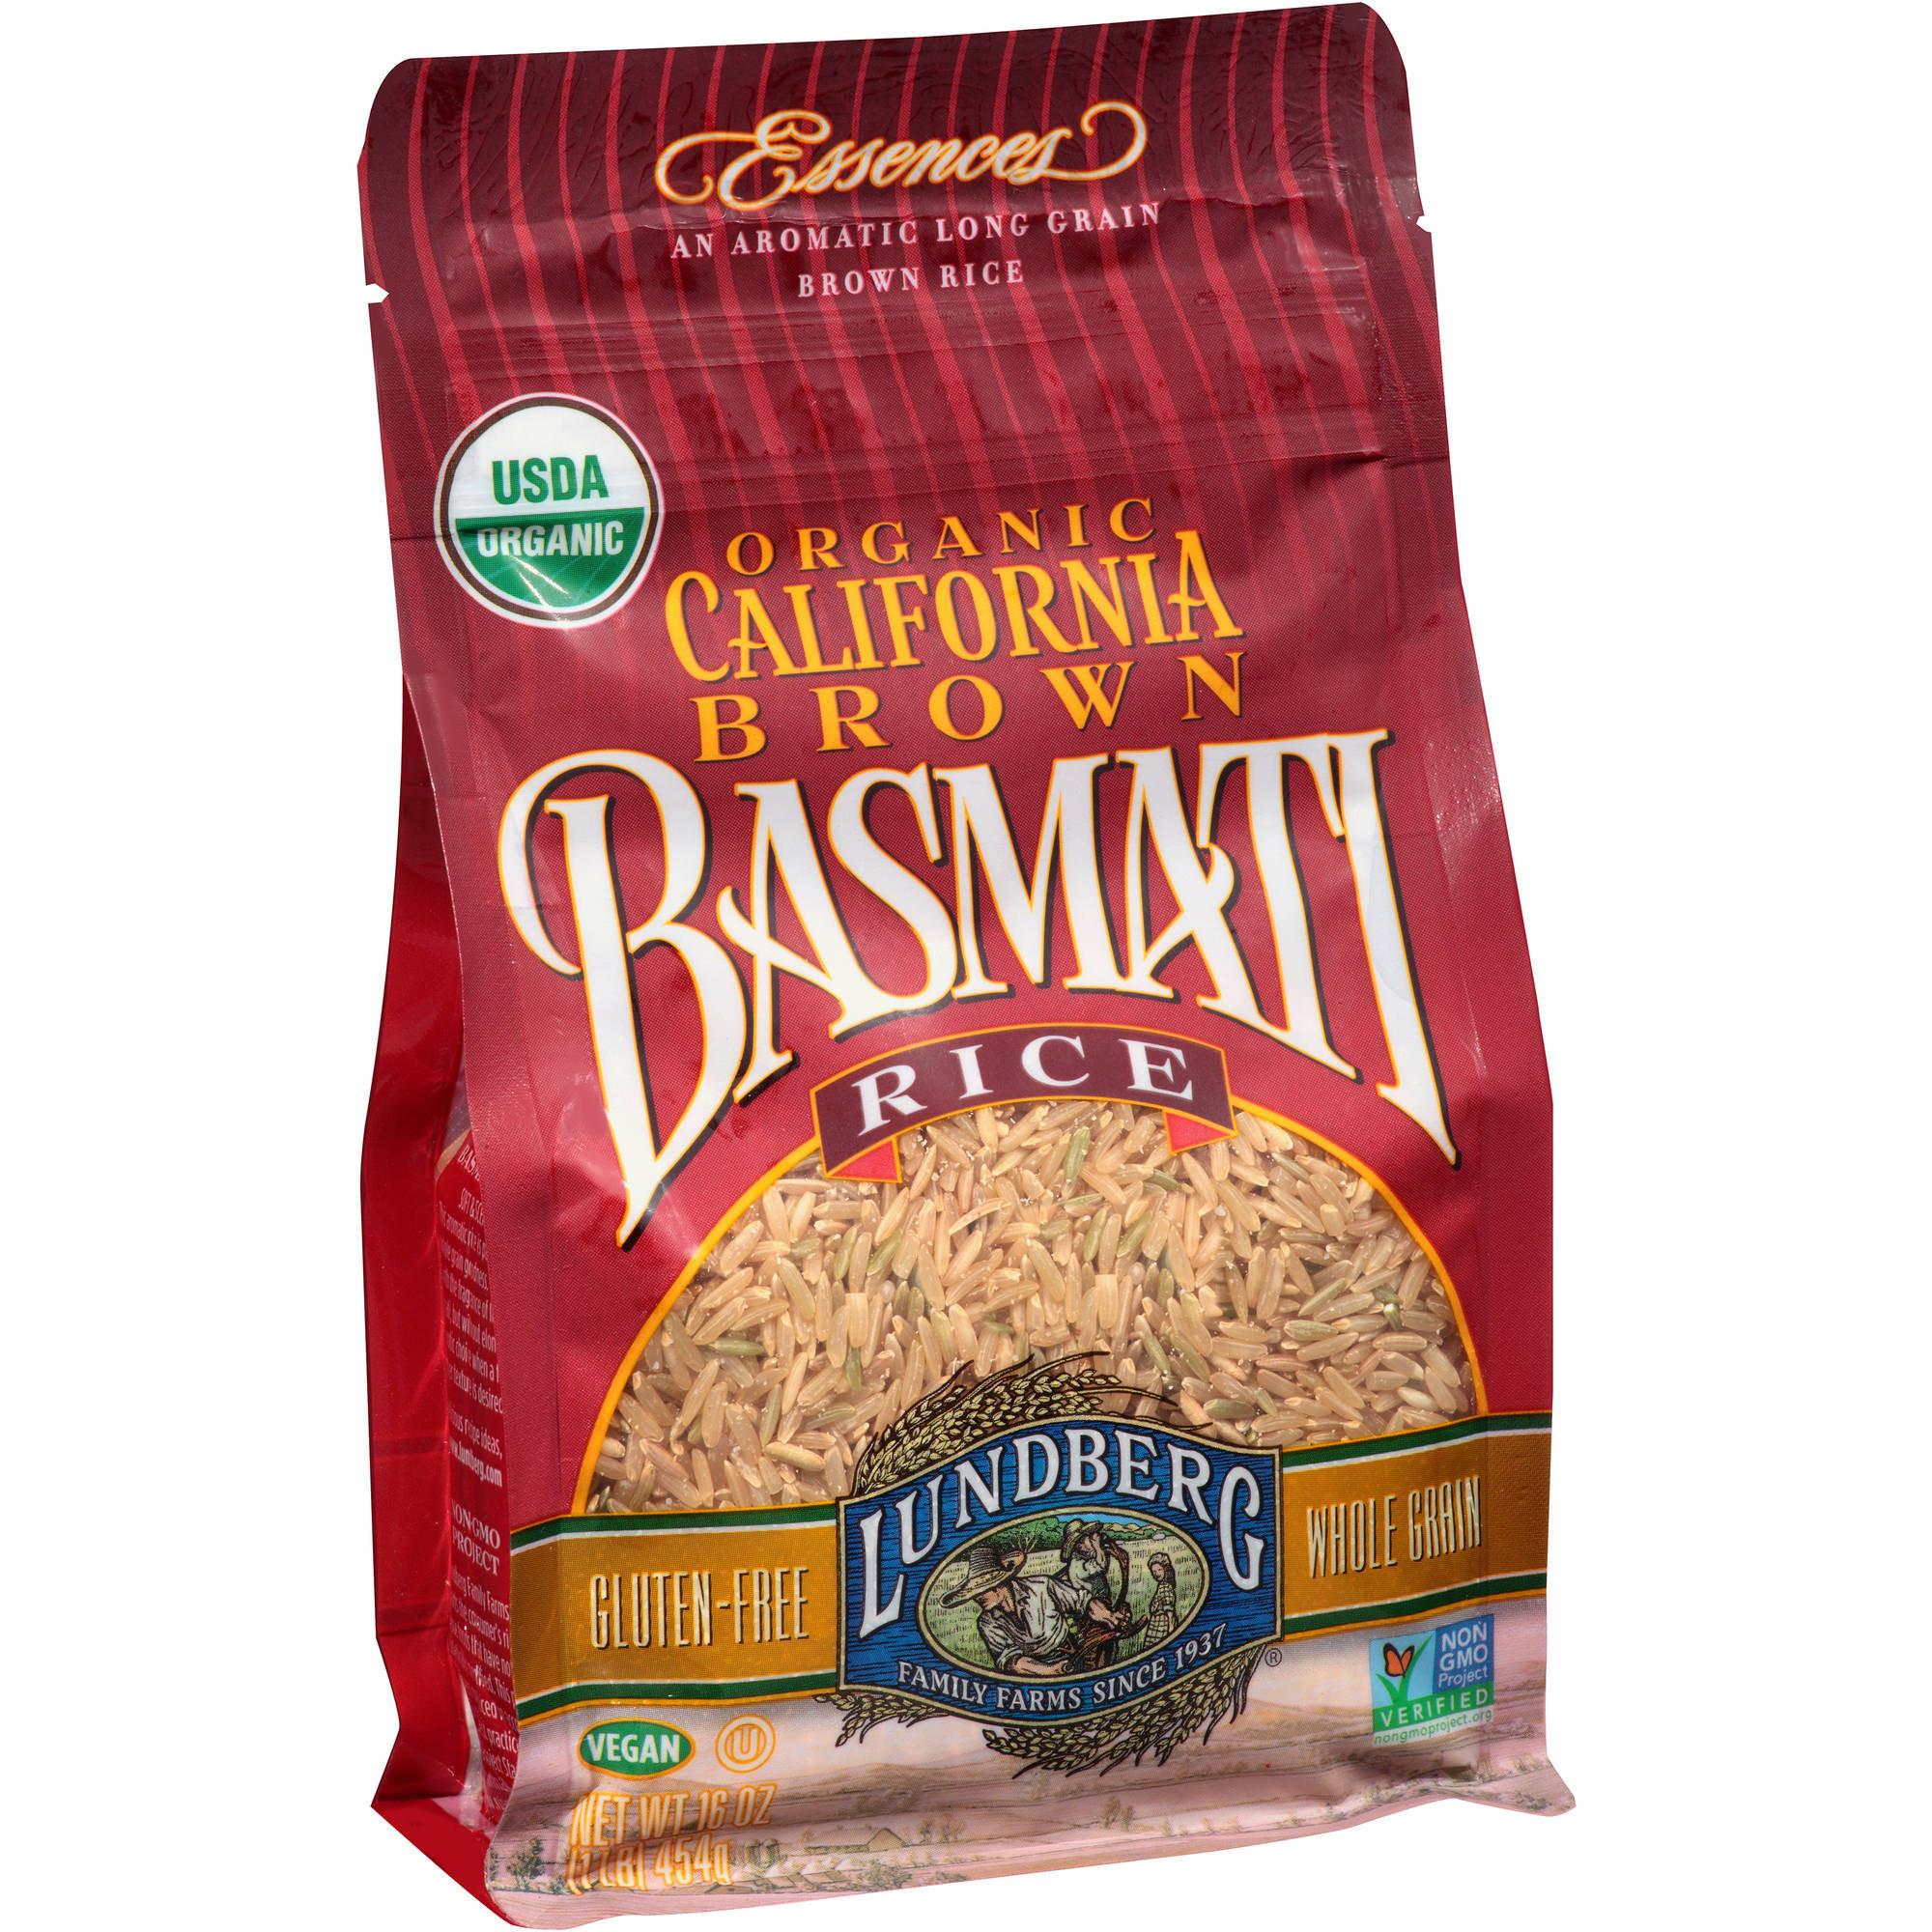 Brown Rice Walmart  Texmati Organic Brown Rice 32 oz Pack of 4 Walmart